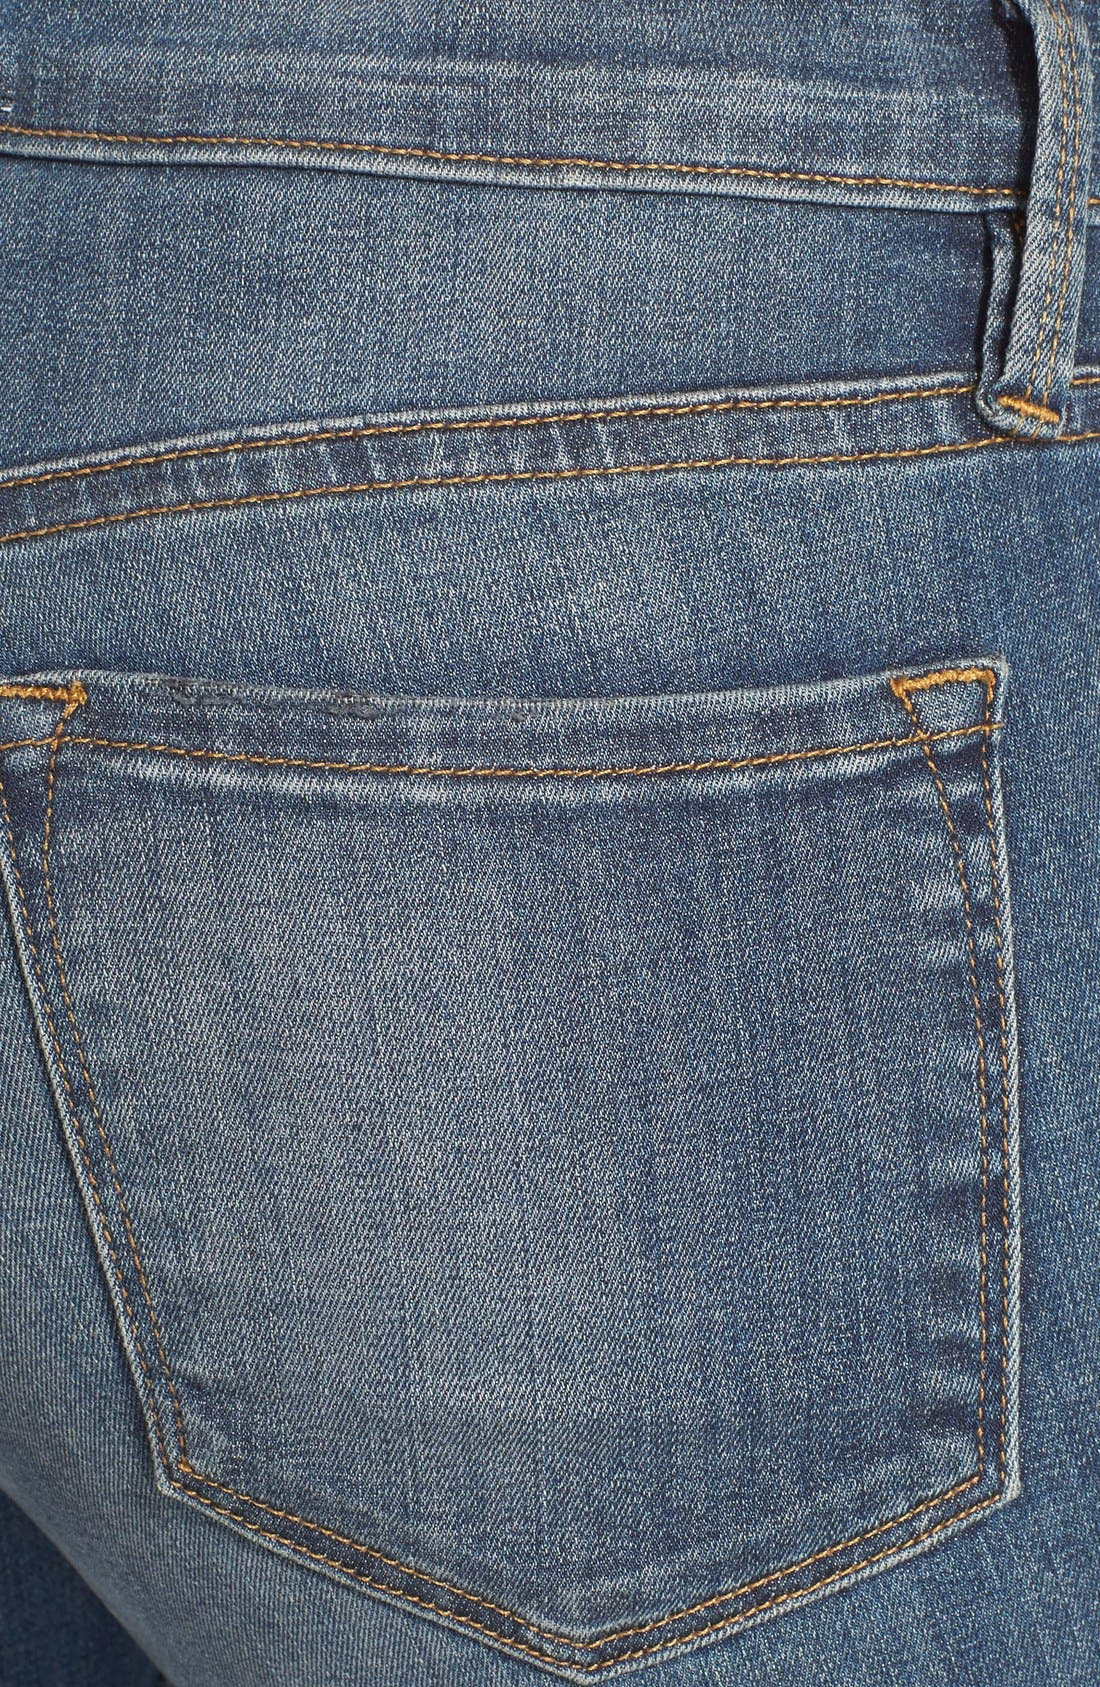 Alternate Image 3  - Frame Denim 'Le Skinny de Jeanne' Jeans